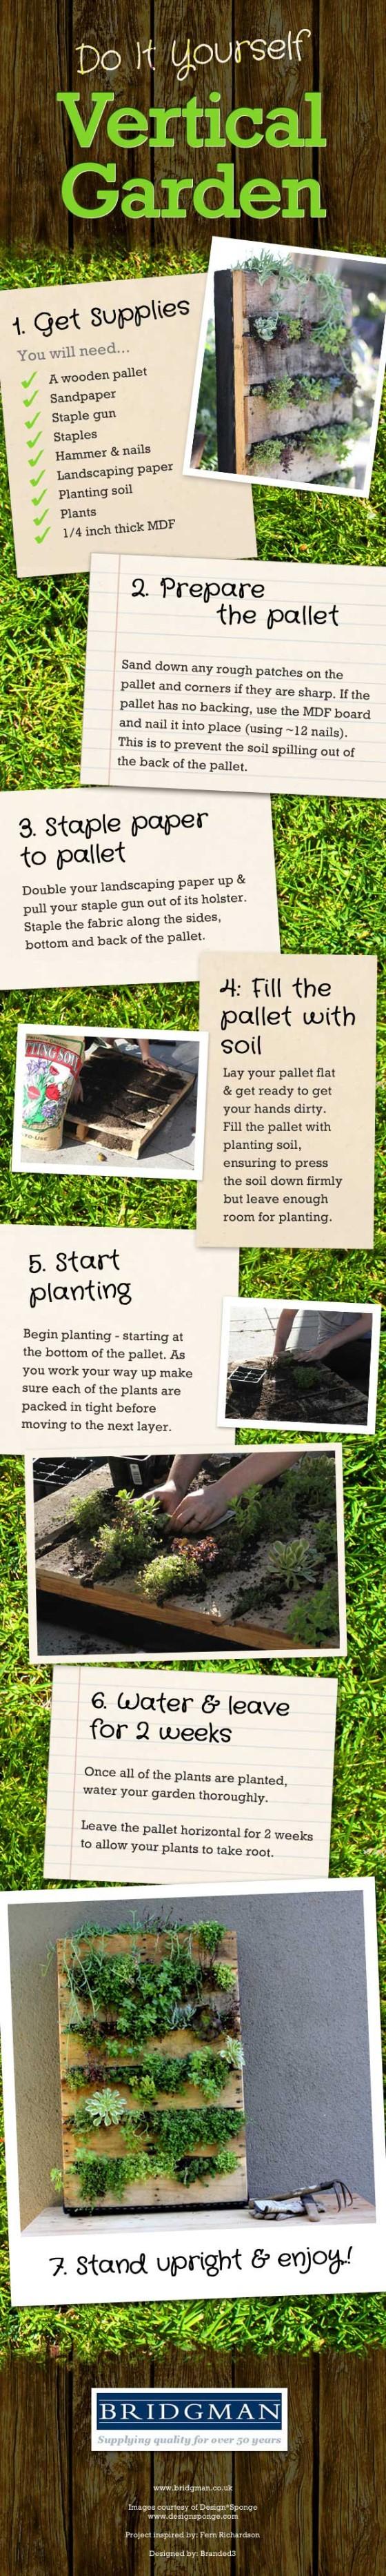 DIY-Vertical-Garden-Wall Infographic